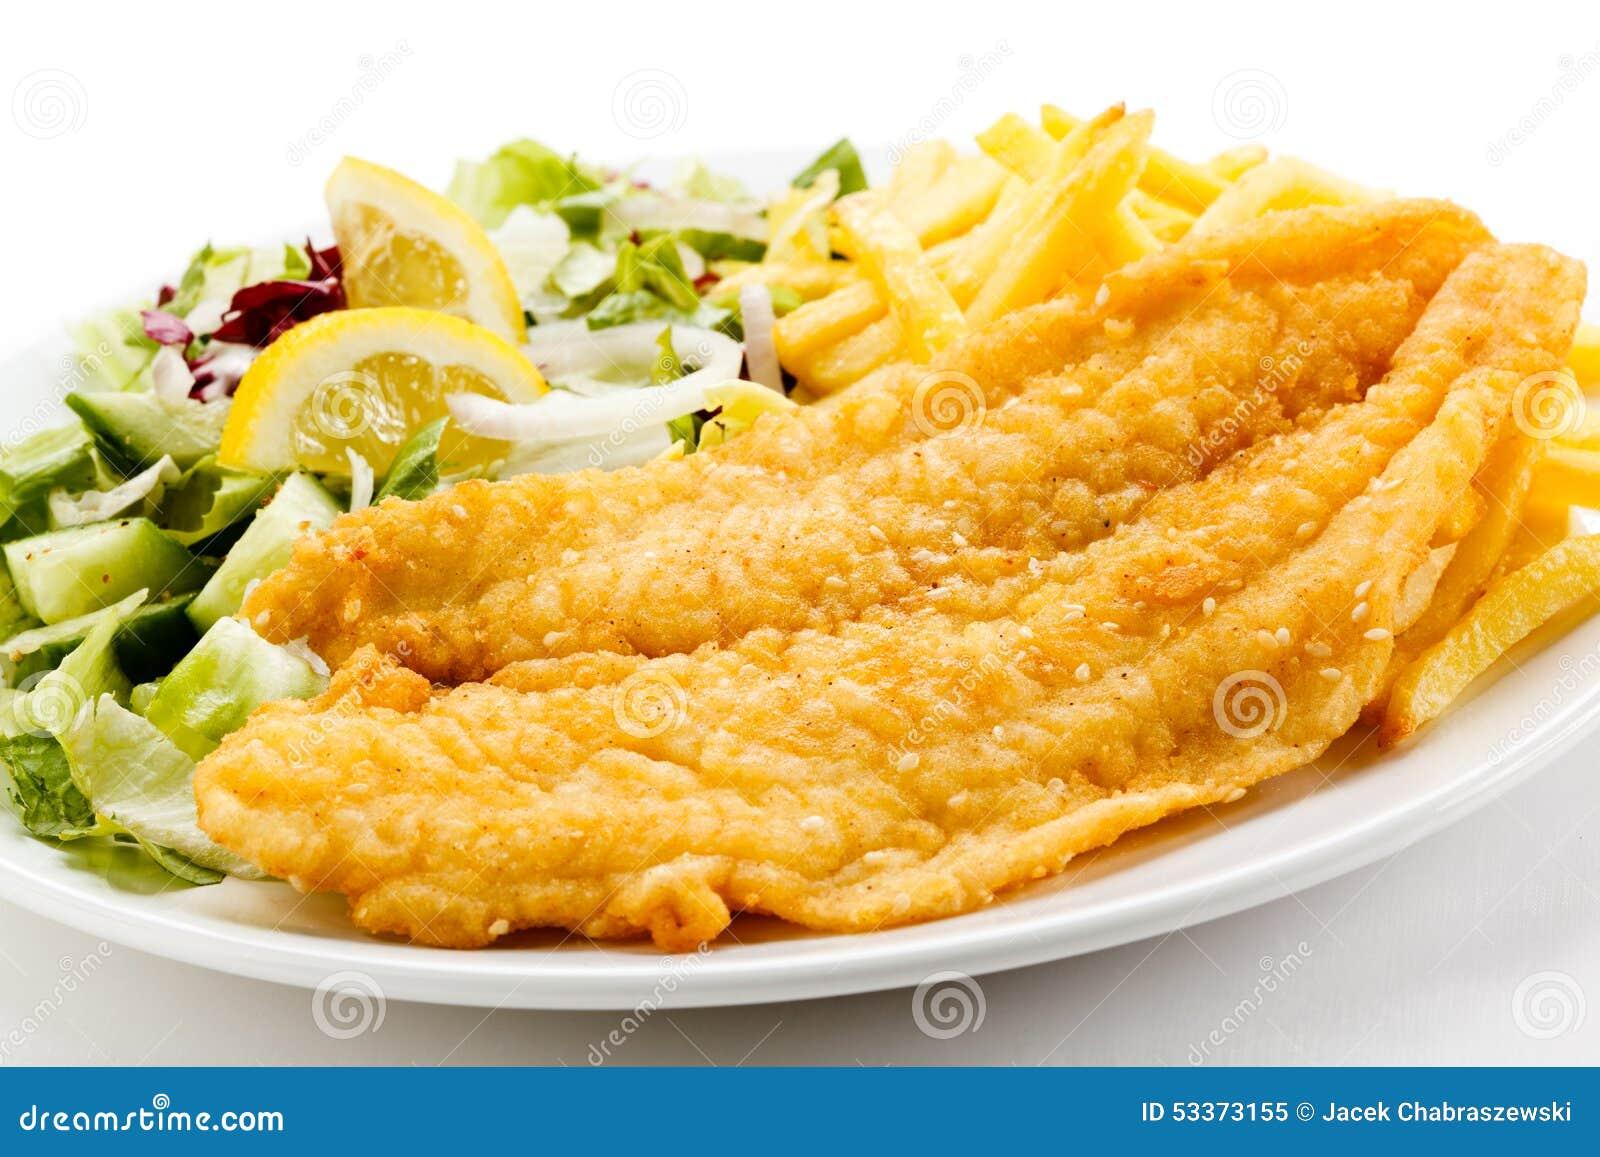 Fried fish fillet stock photo image 53373155 for Fried fish fillet